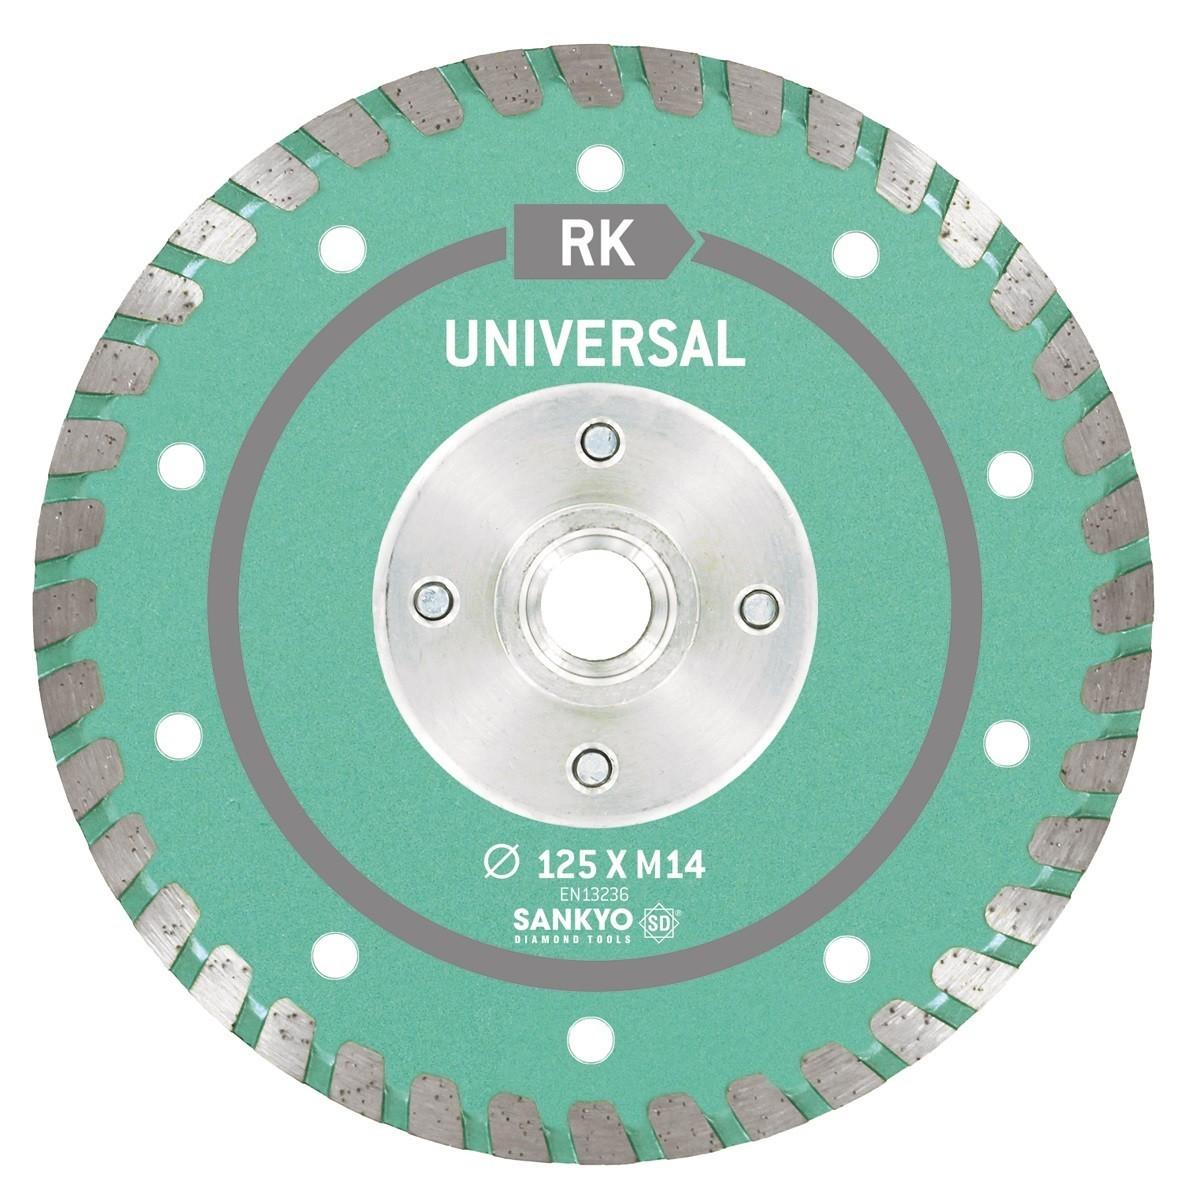 Sankyo universeel diamantzaagblad SU-RK-M14-Ø125